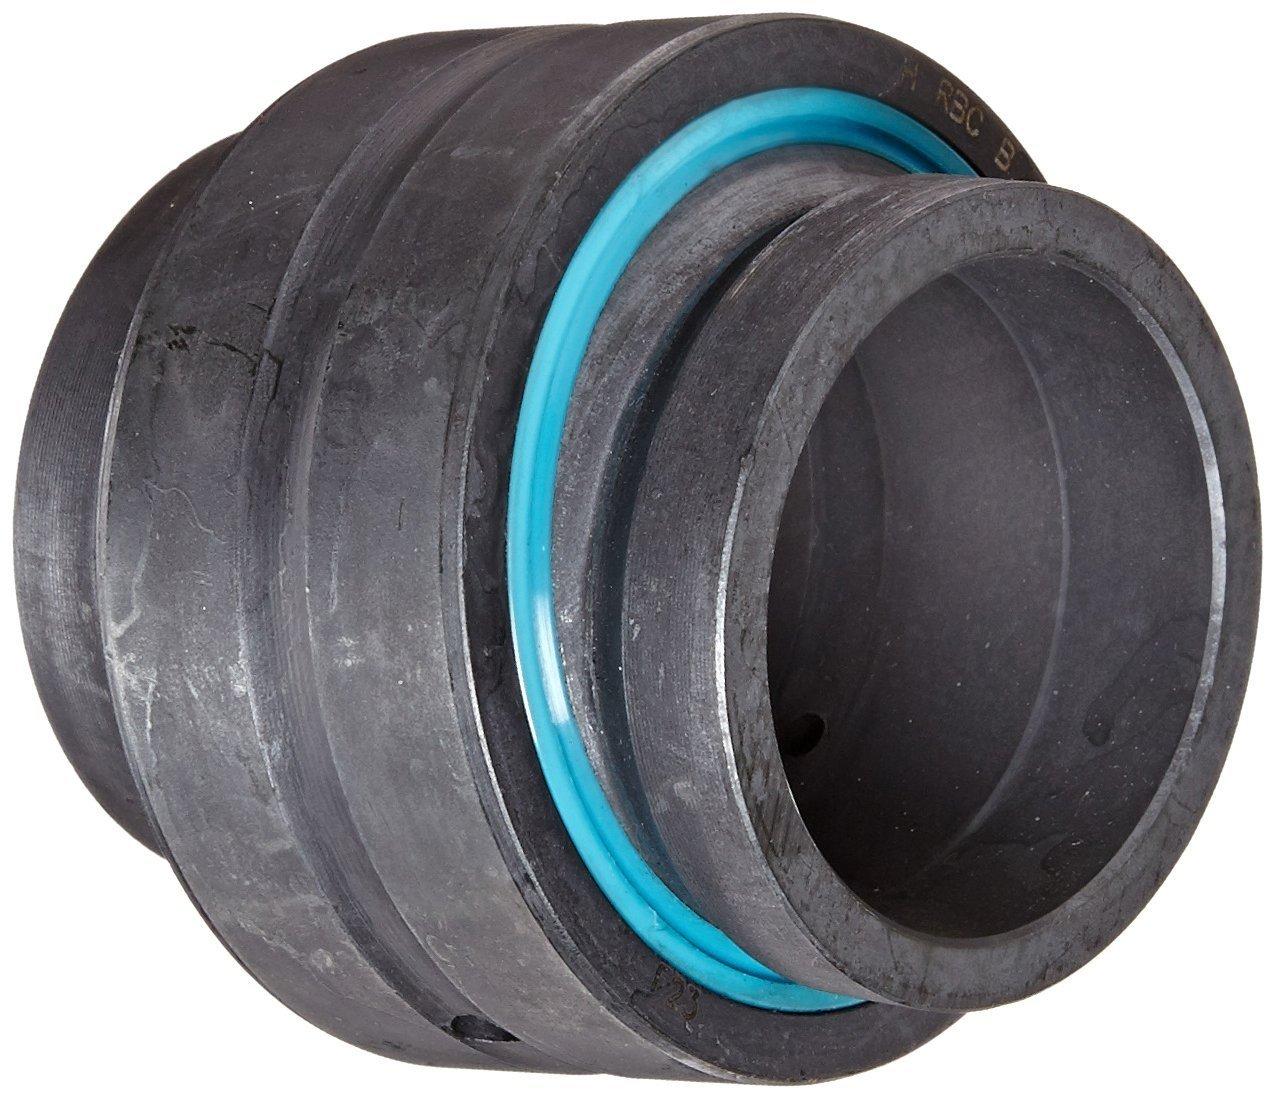 508600 In-Lbs Maximum Torque 0.75 x 1.5 Keyway 6.03 Length Through Bore 6.0625 Bore 9.51 OD 9.51 Overall Length 9.51 OD 6.0625 Bore 6.03 Length Through Bore Lovejoy 69790435763 Steel Hercuflex FXL Series 5 Gear Hub 0.75 x 1.5 Keyway